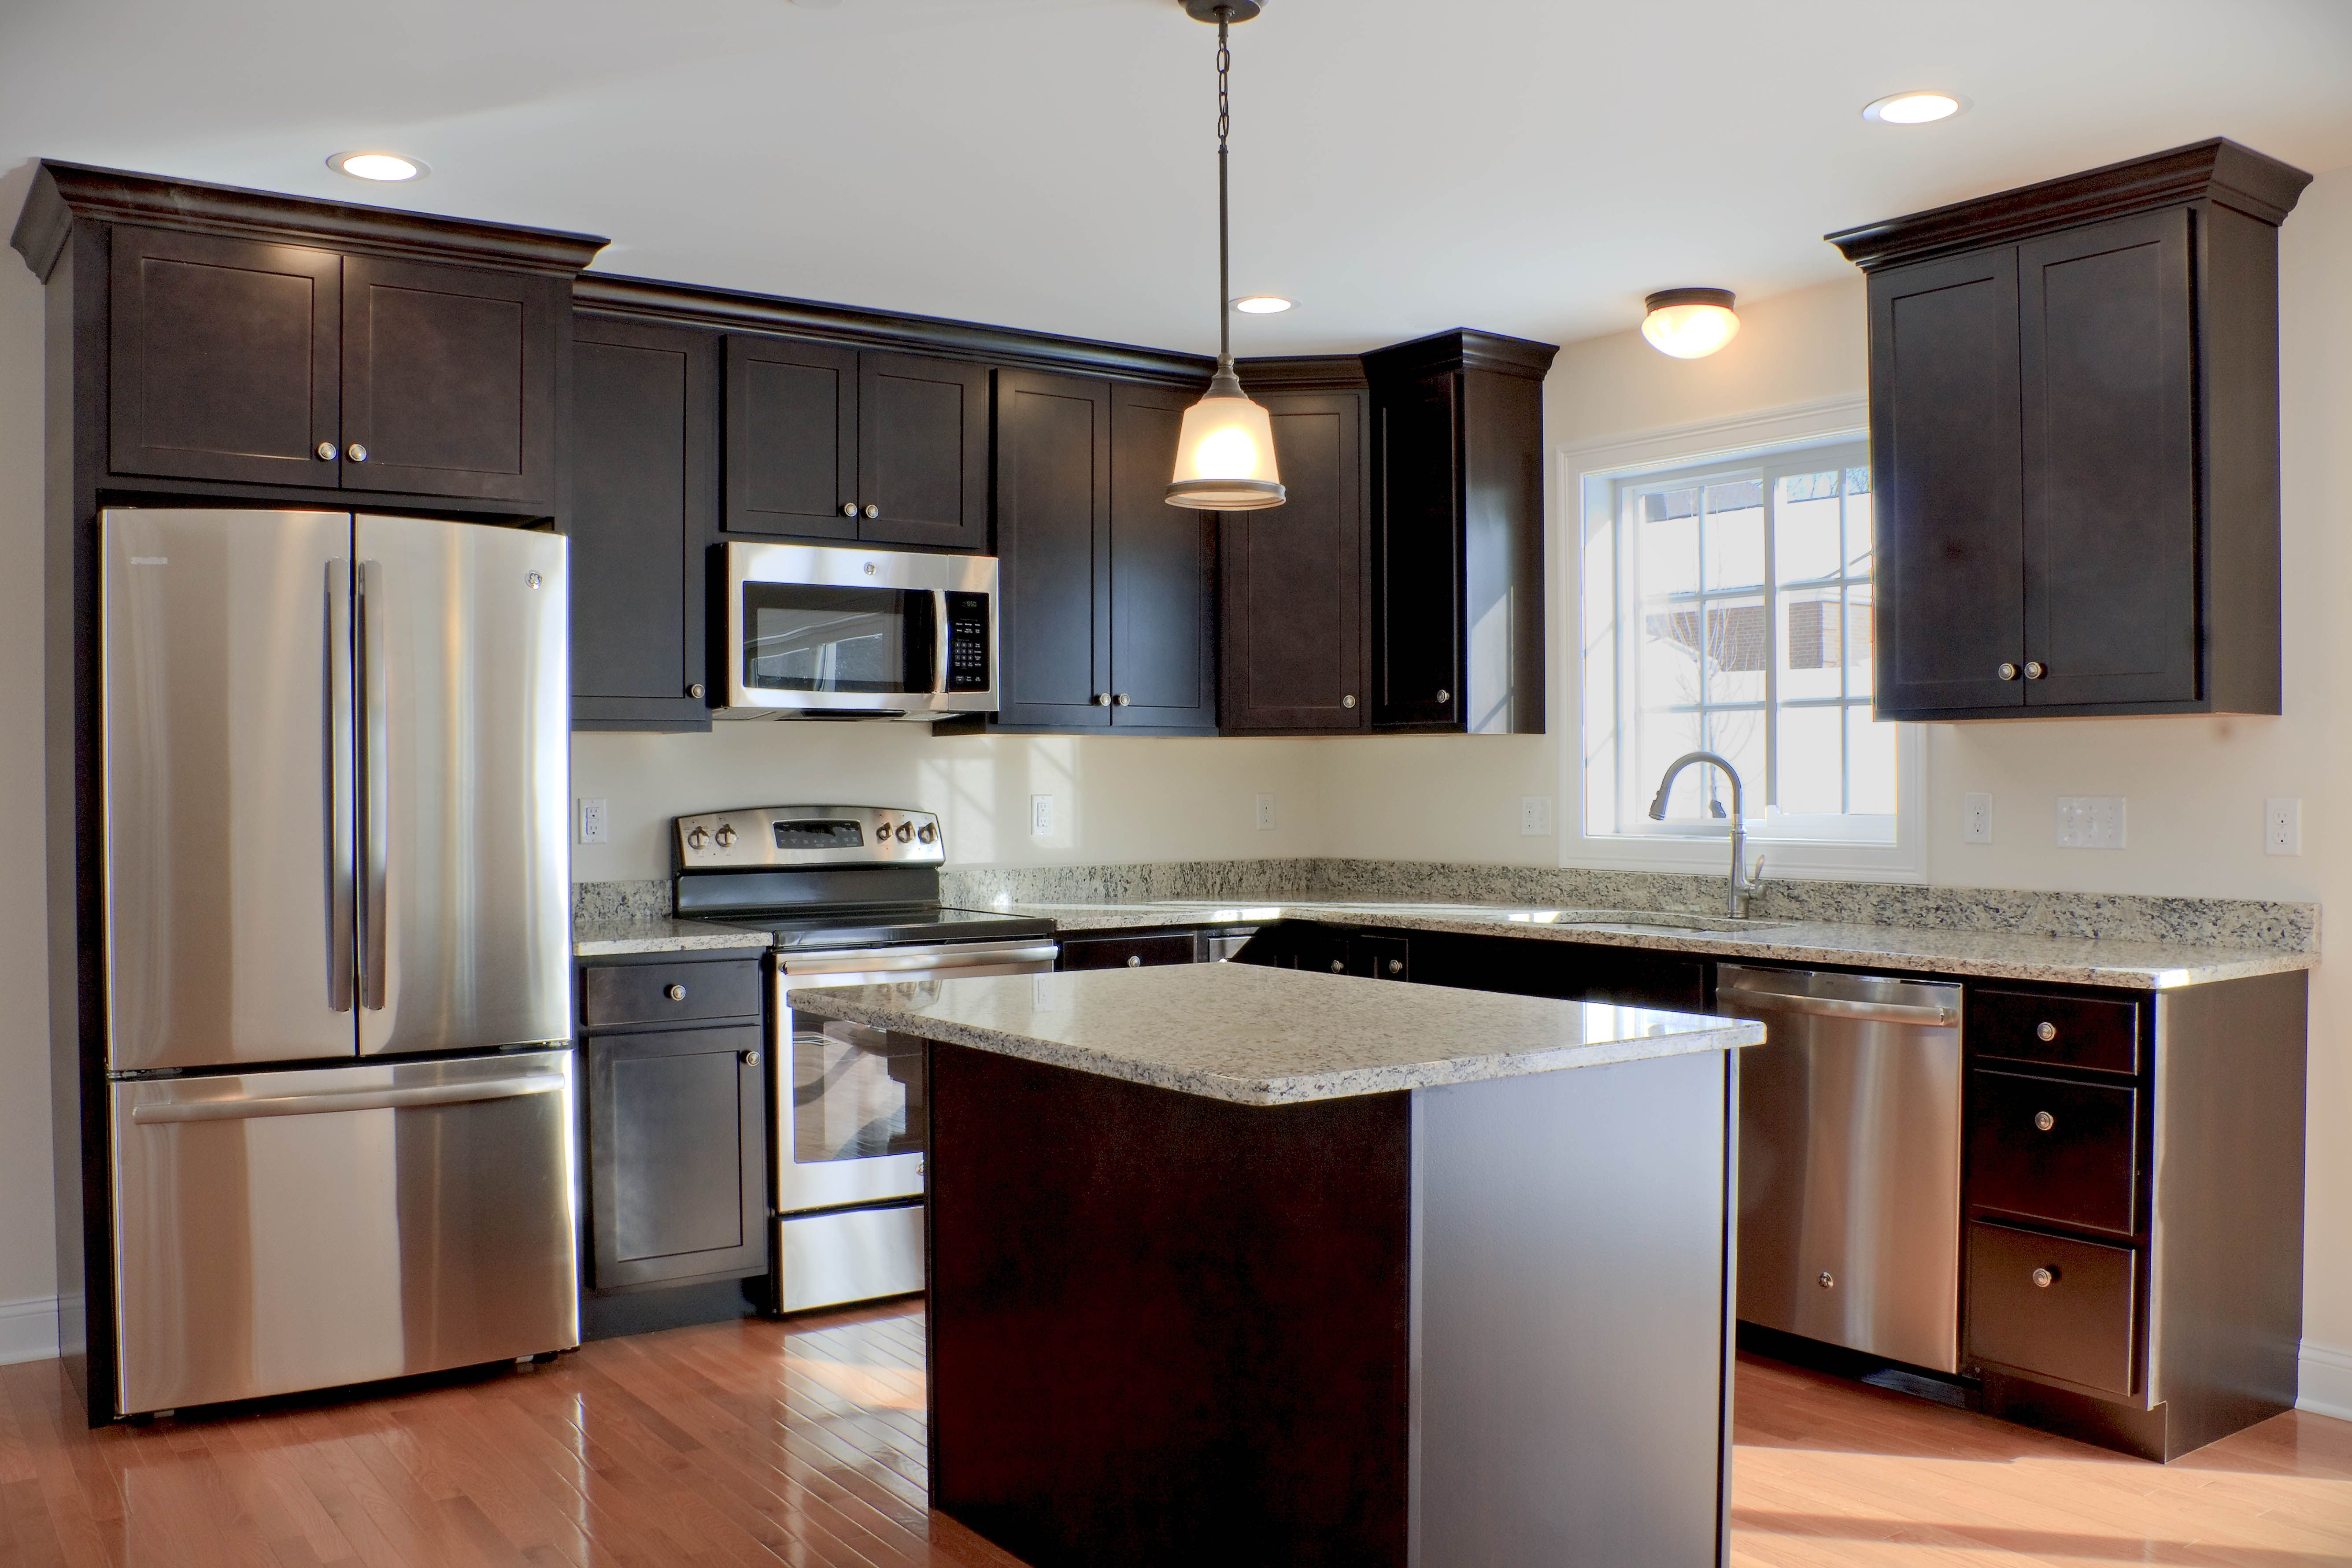 arbor in java with granite in santa cecillia light interior floor plan kitchen cabinets home on kitchen cabinets java id=14022